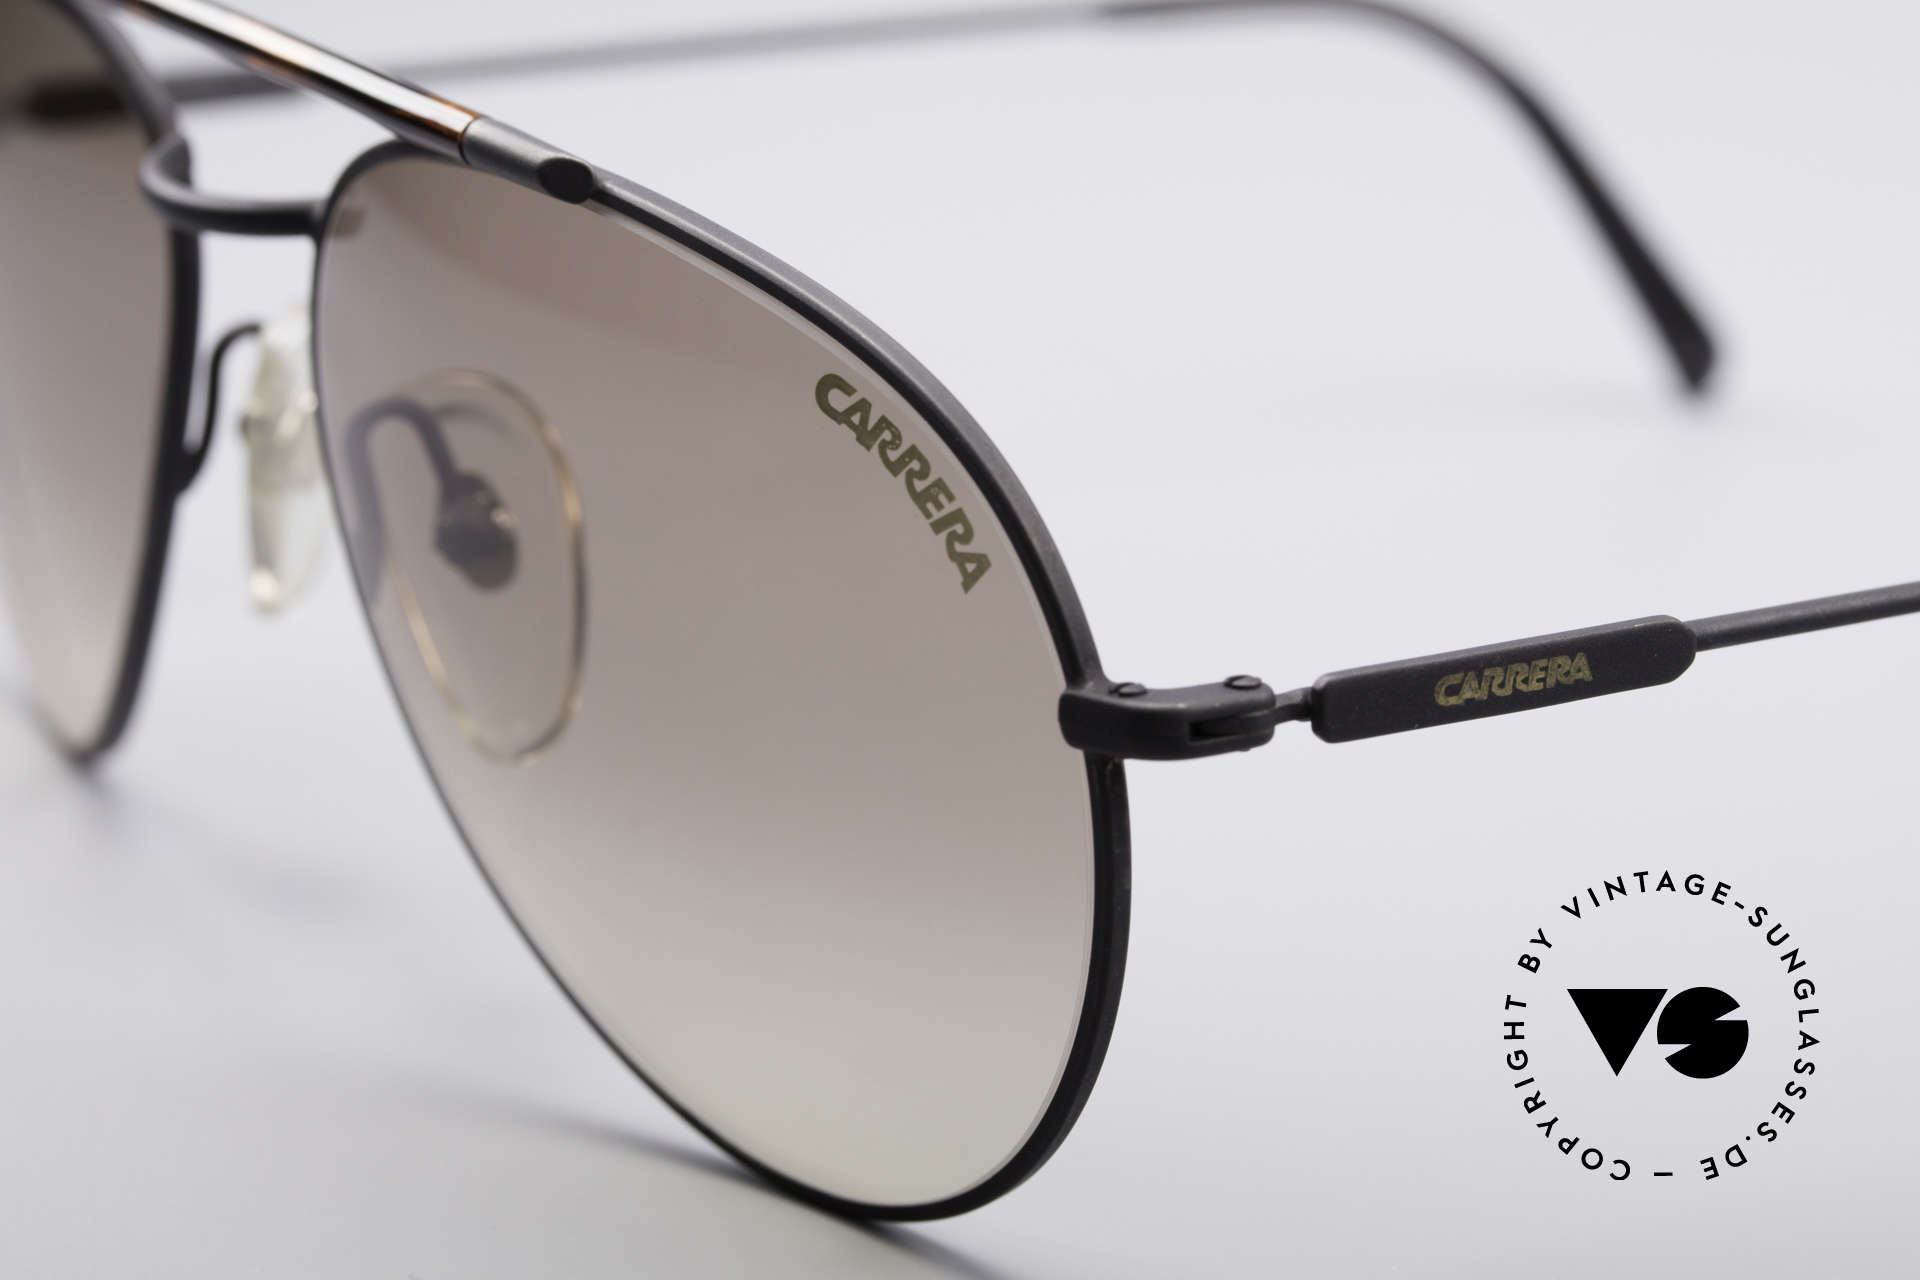 Carrera 5349 True Vintage 80's Shades, brown-gradient Carrera lenses (100% UV protection), Made for Men